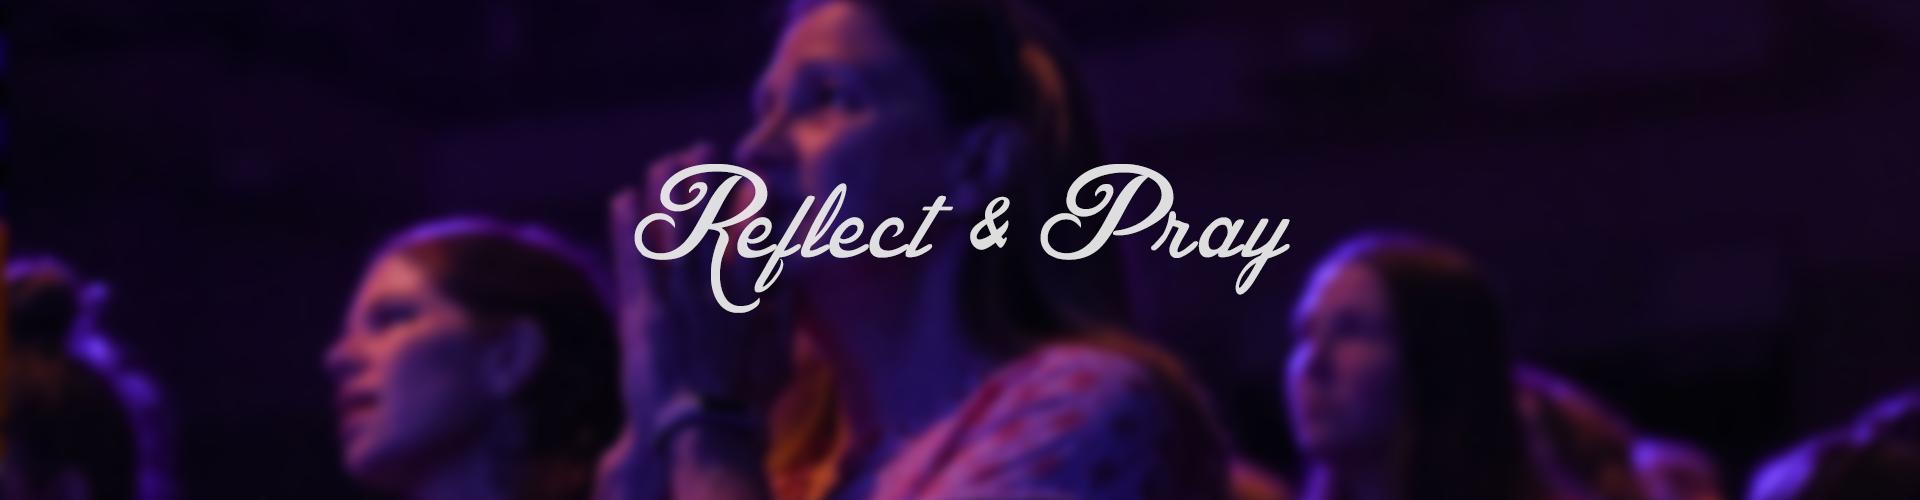 Reflect & Pray